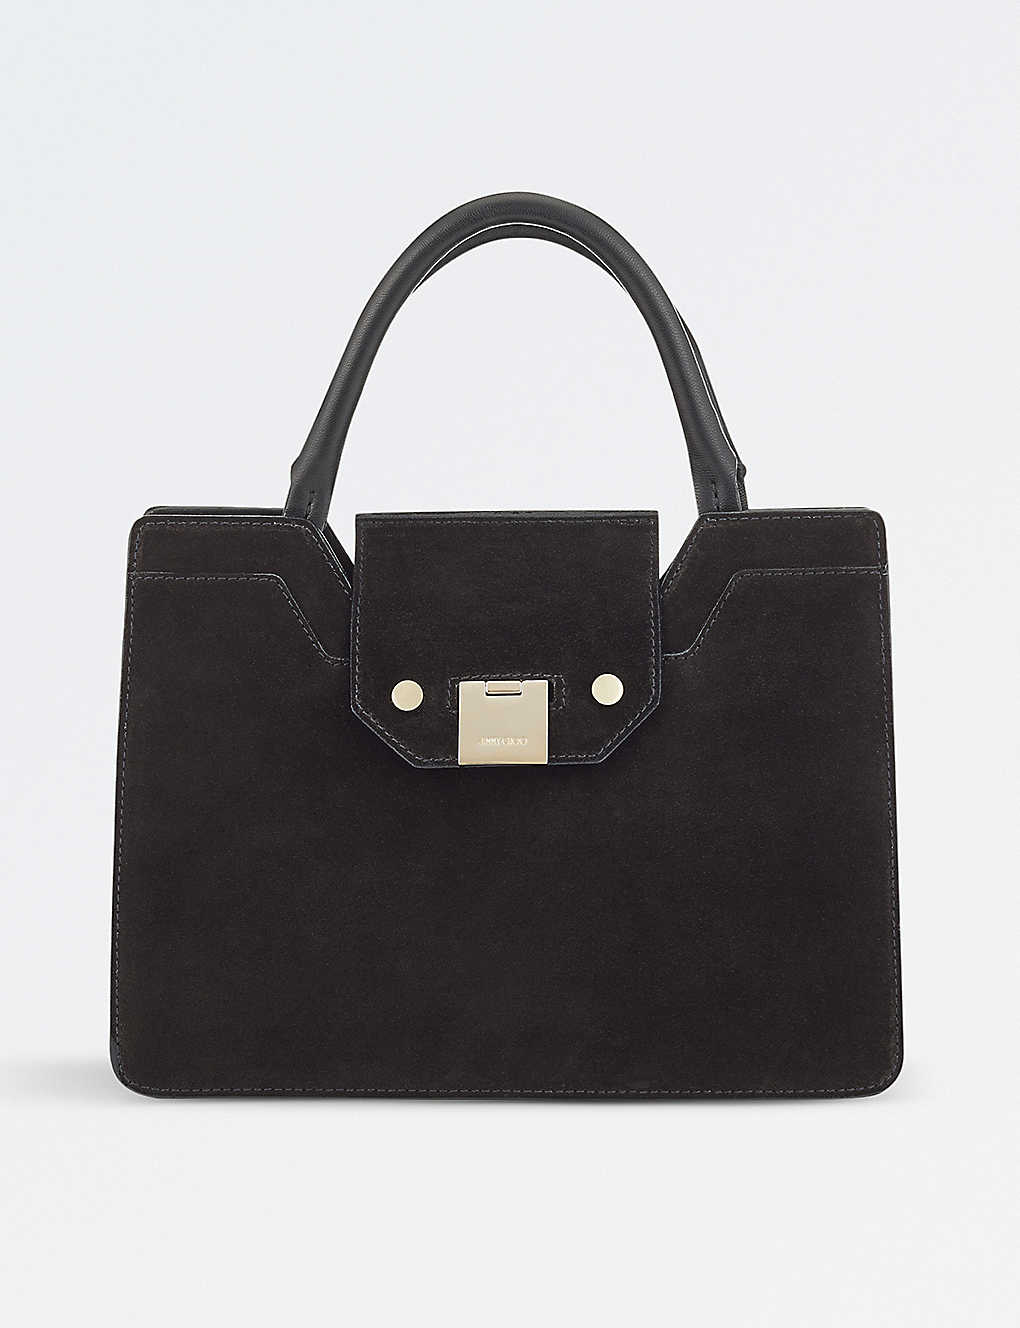 461b5d70604 JIMMY CHOO - Rebel small suede tote bag | Selfridges.com